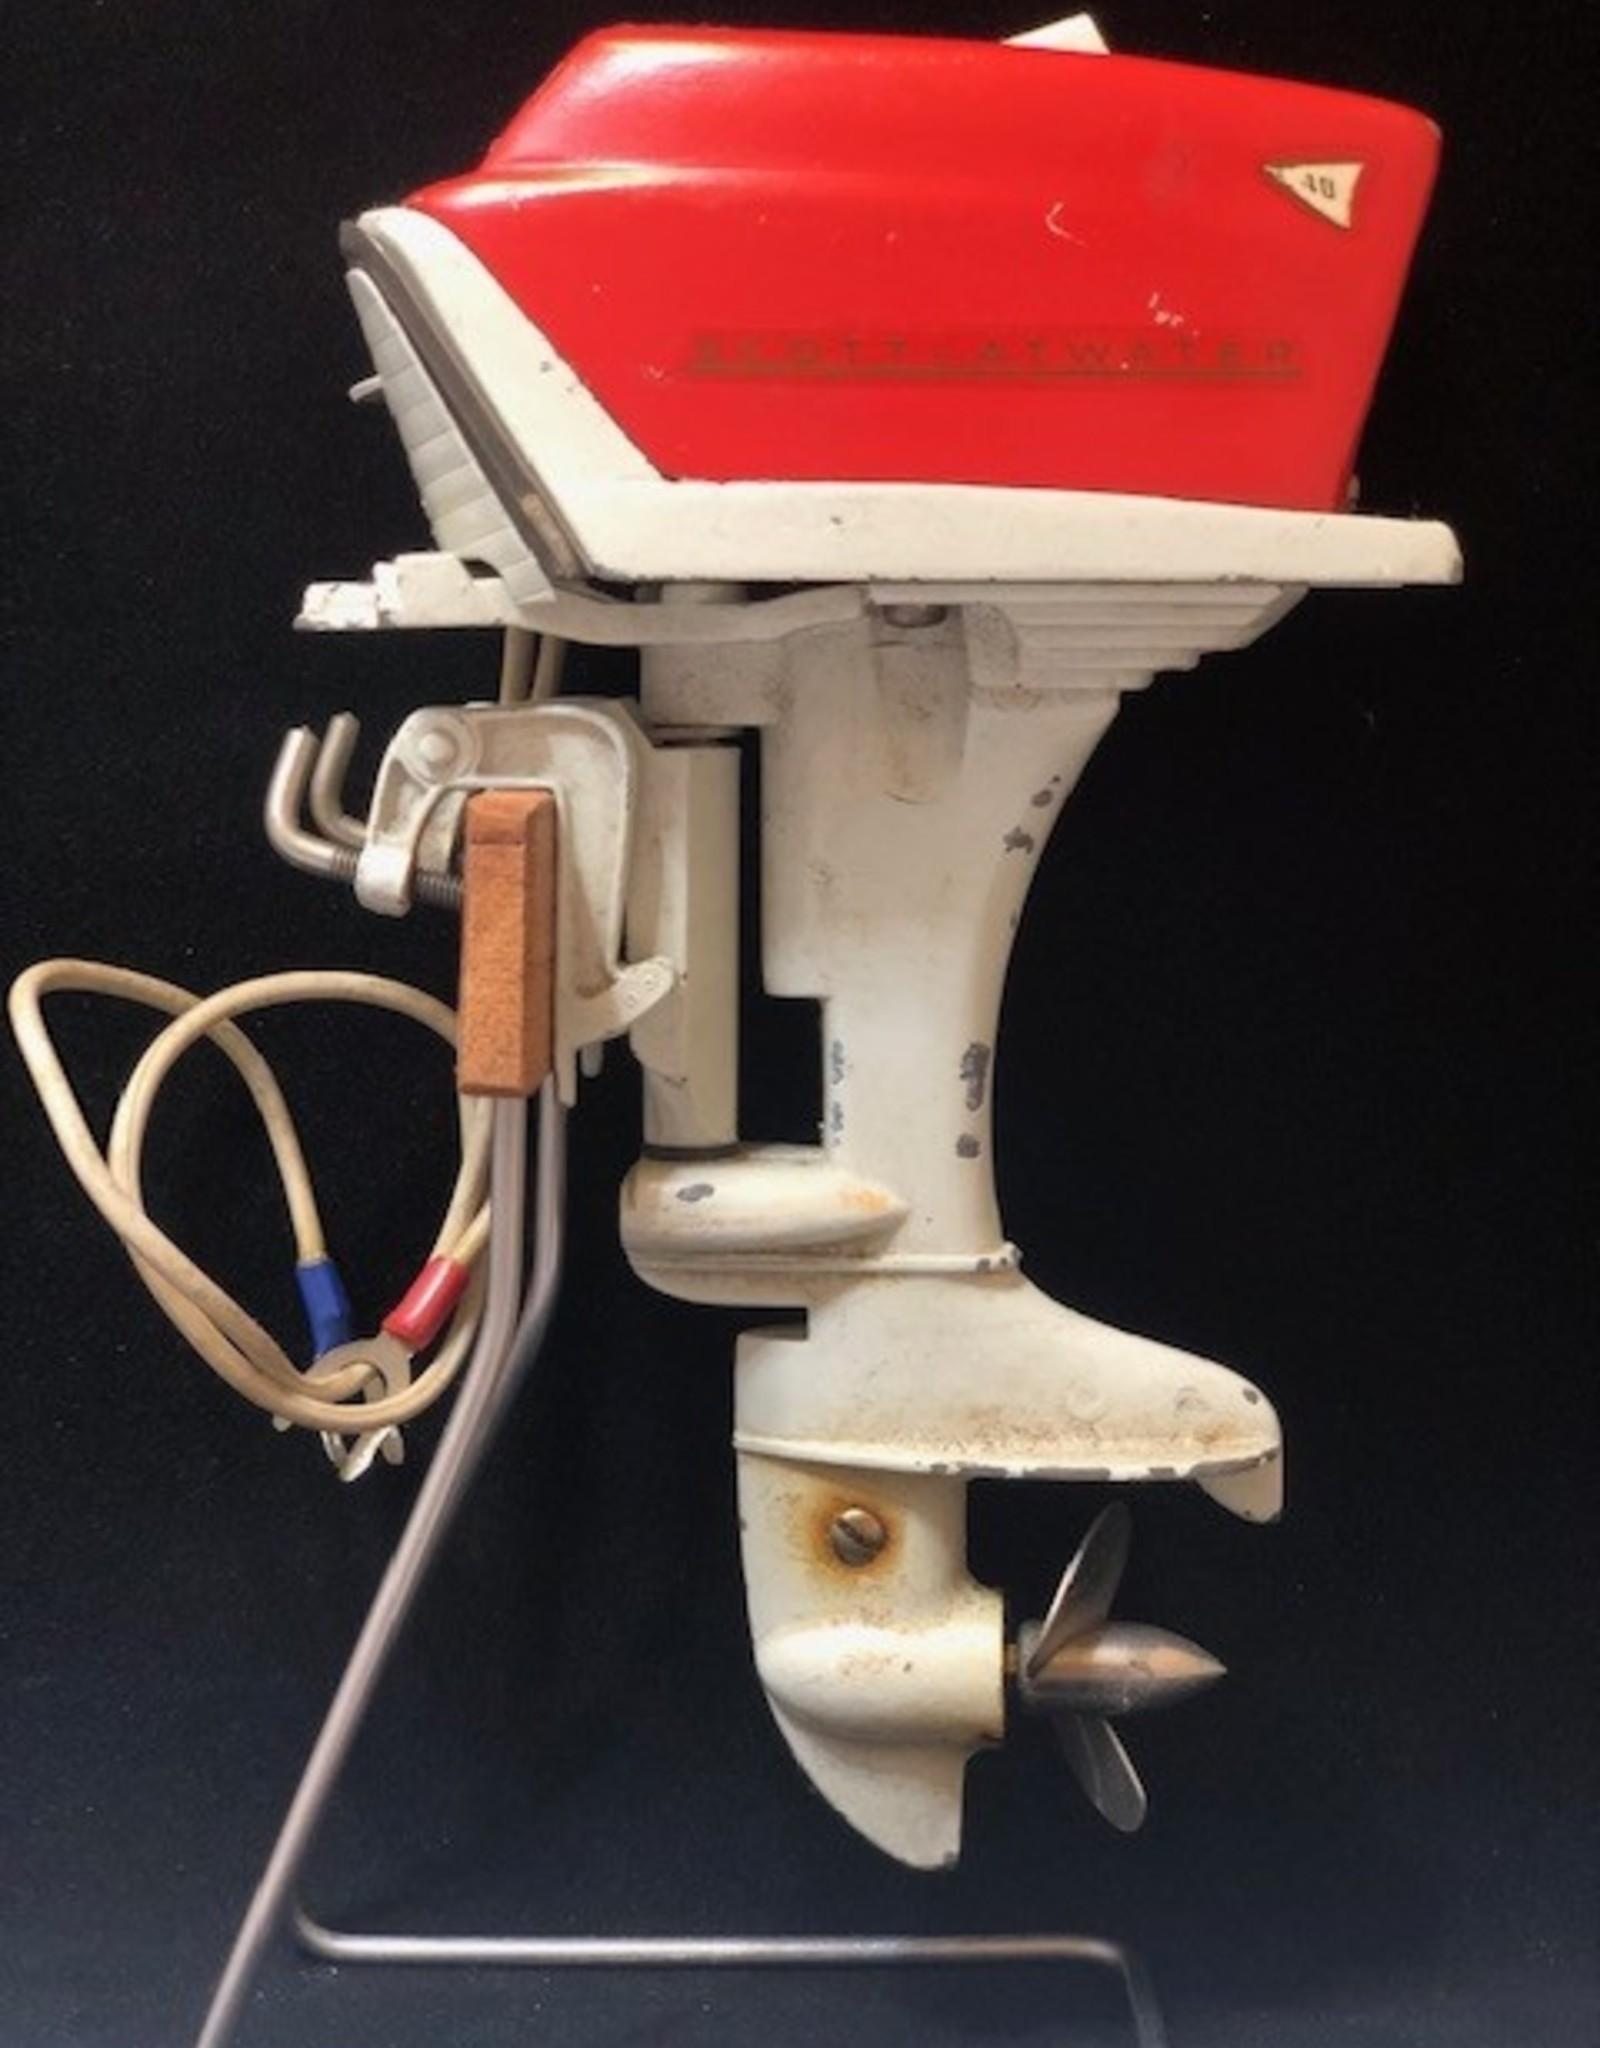 WALTER (BUZZ) LAMB 1958 SCOTT ATWATER 40HP RED MINI MOTOR